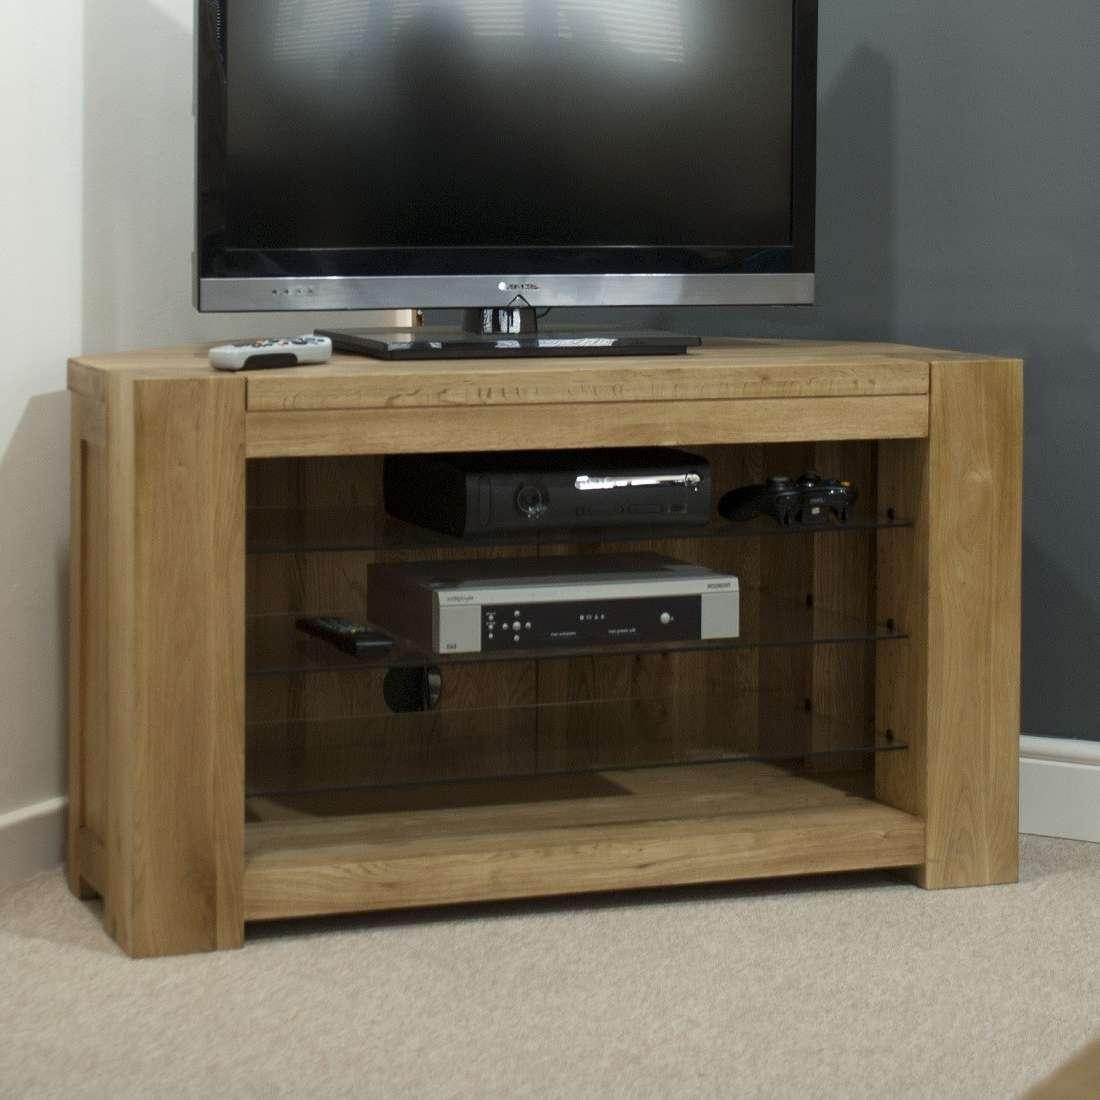 Tv Stands : Oak Tv Units Cabinets Furniture Uk Wooden Corner Solid Intended For Wooden Tv Stands Corner Units (View 3 of 15)